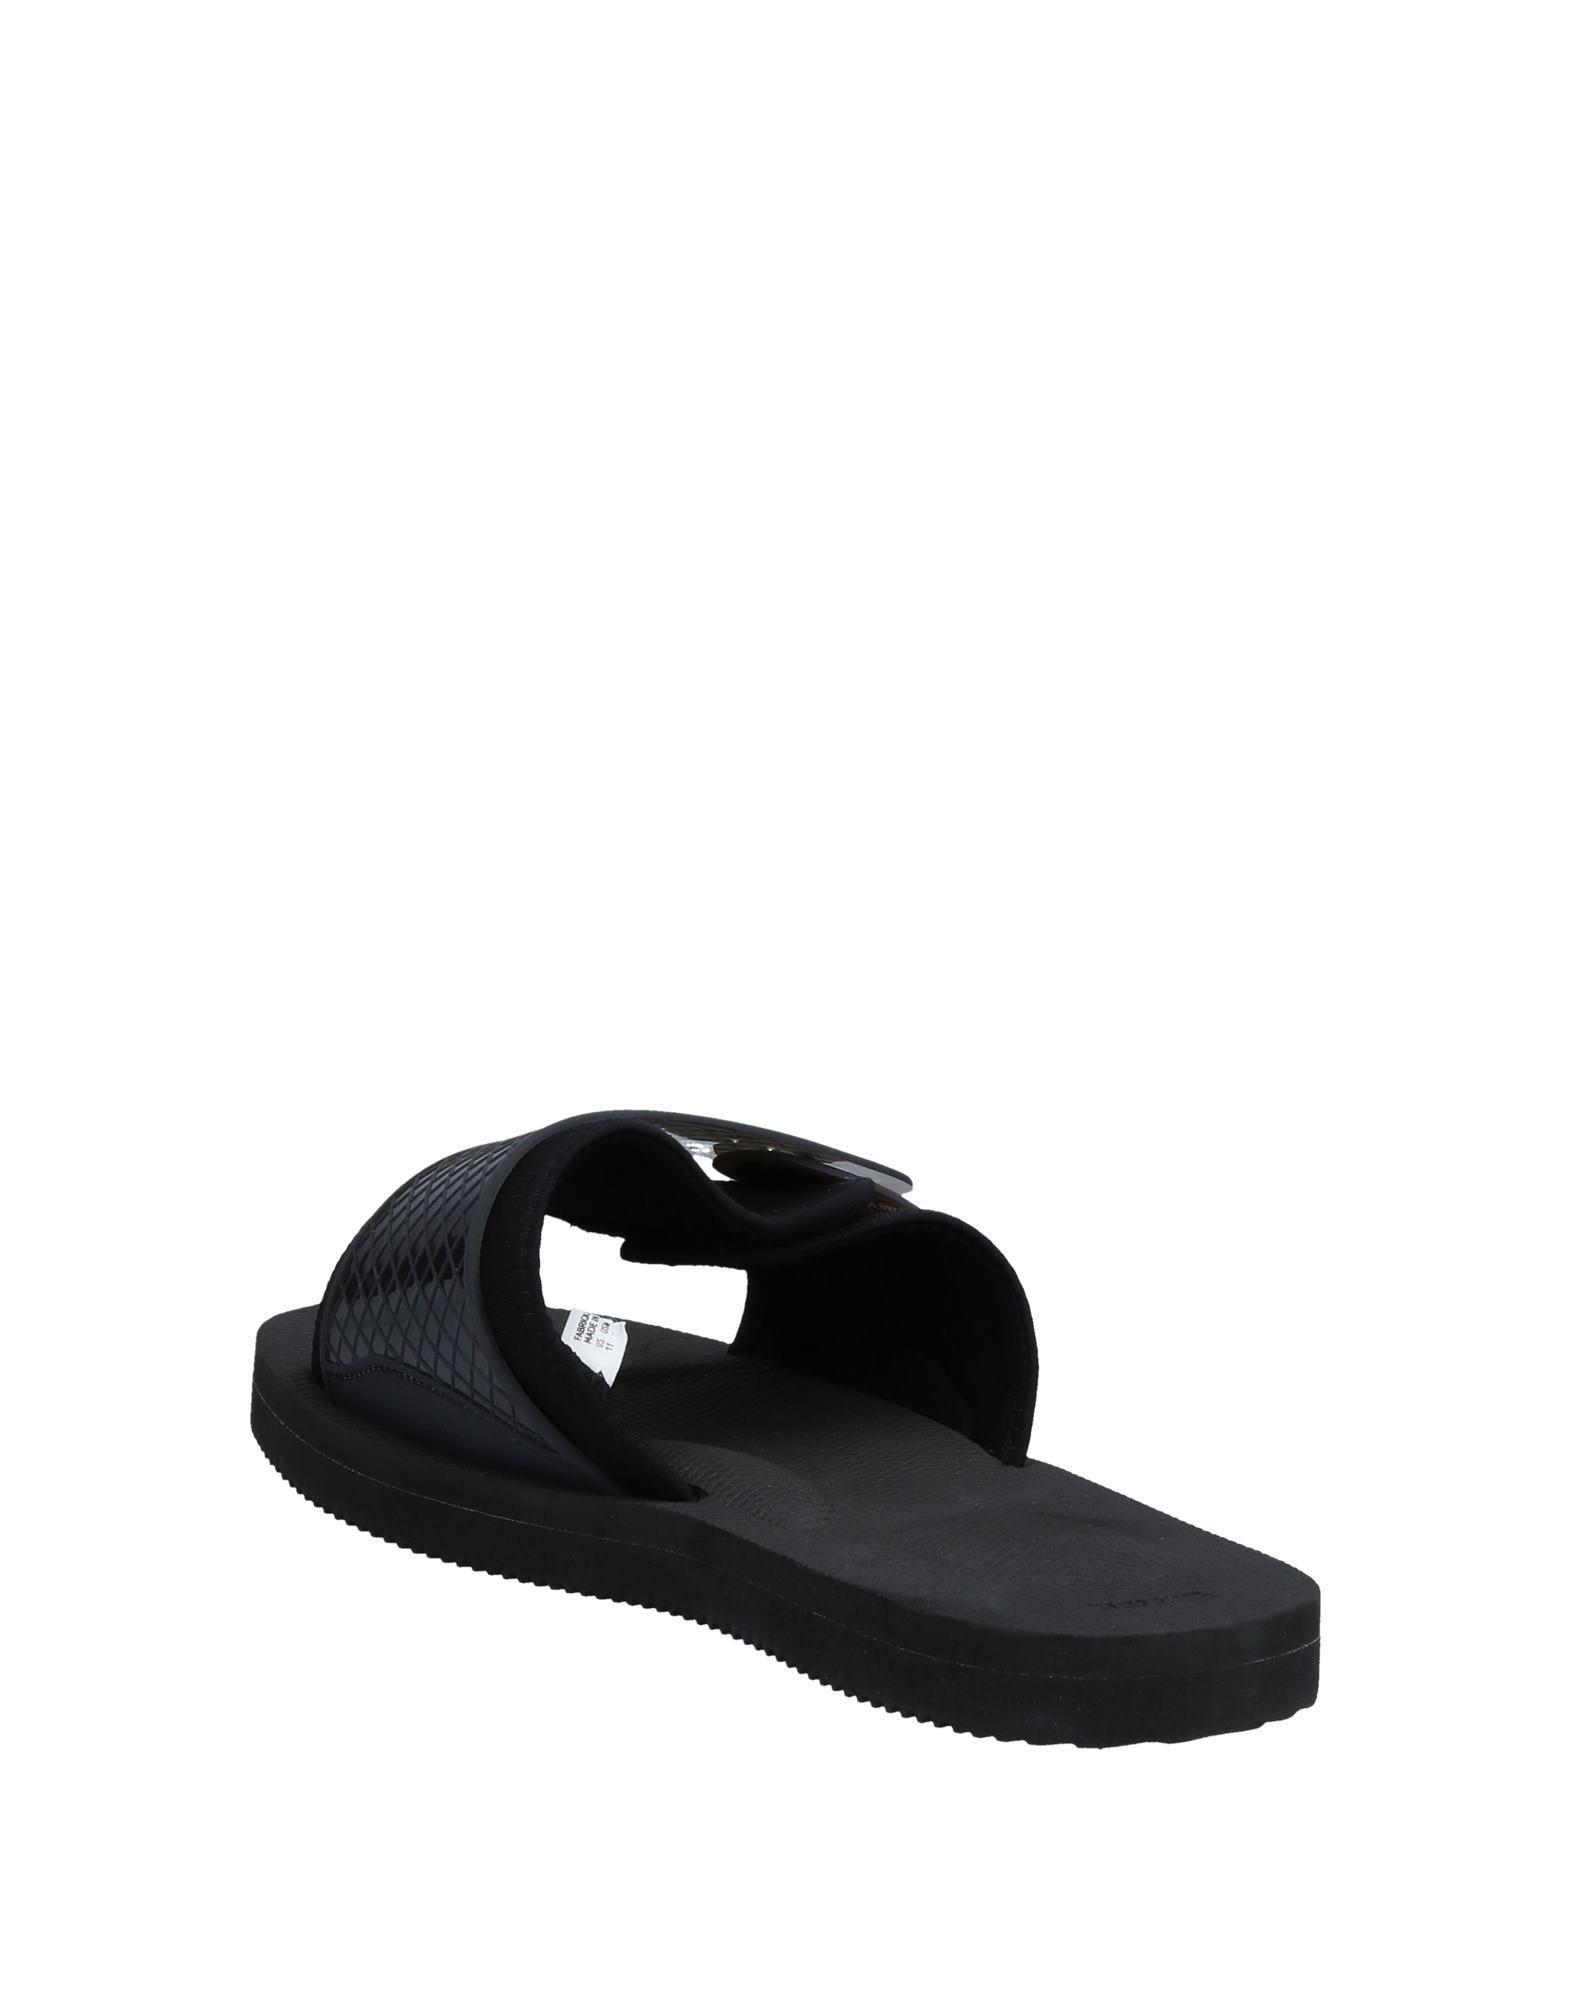 f5464ef7198 Lyst - Suicoke Sandals in Black for Men